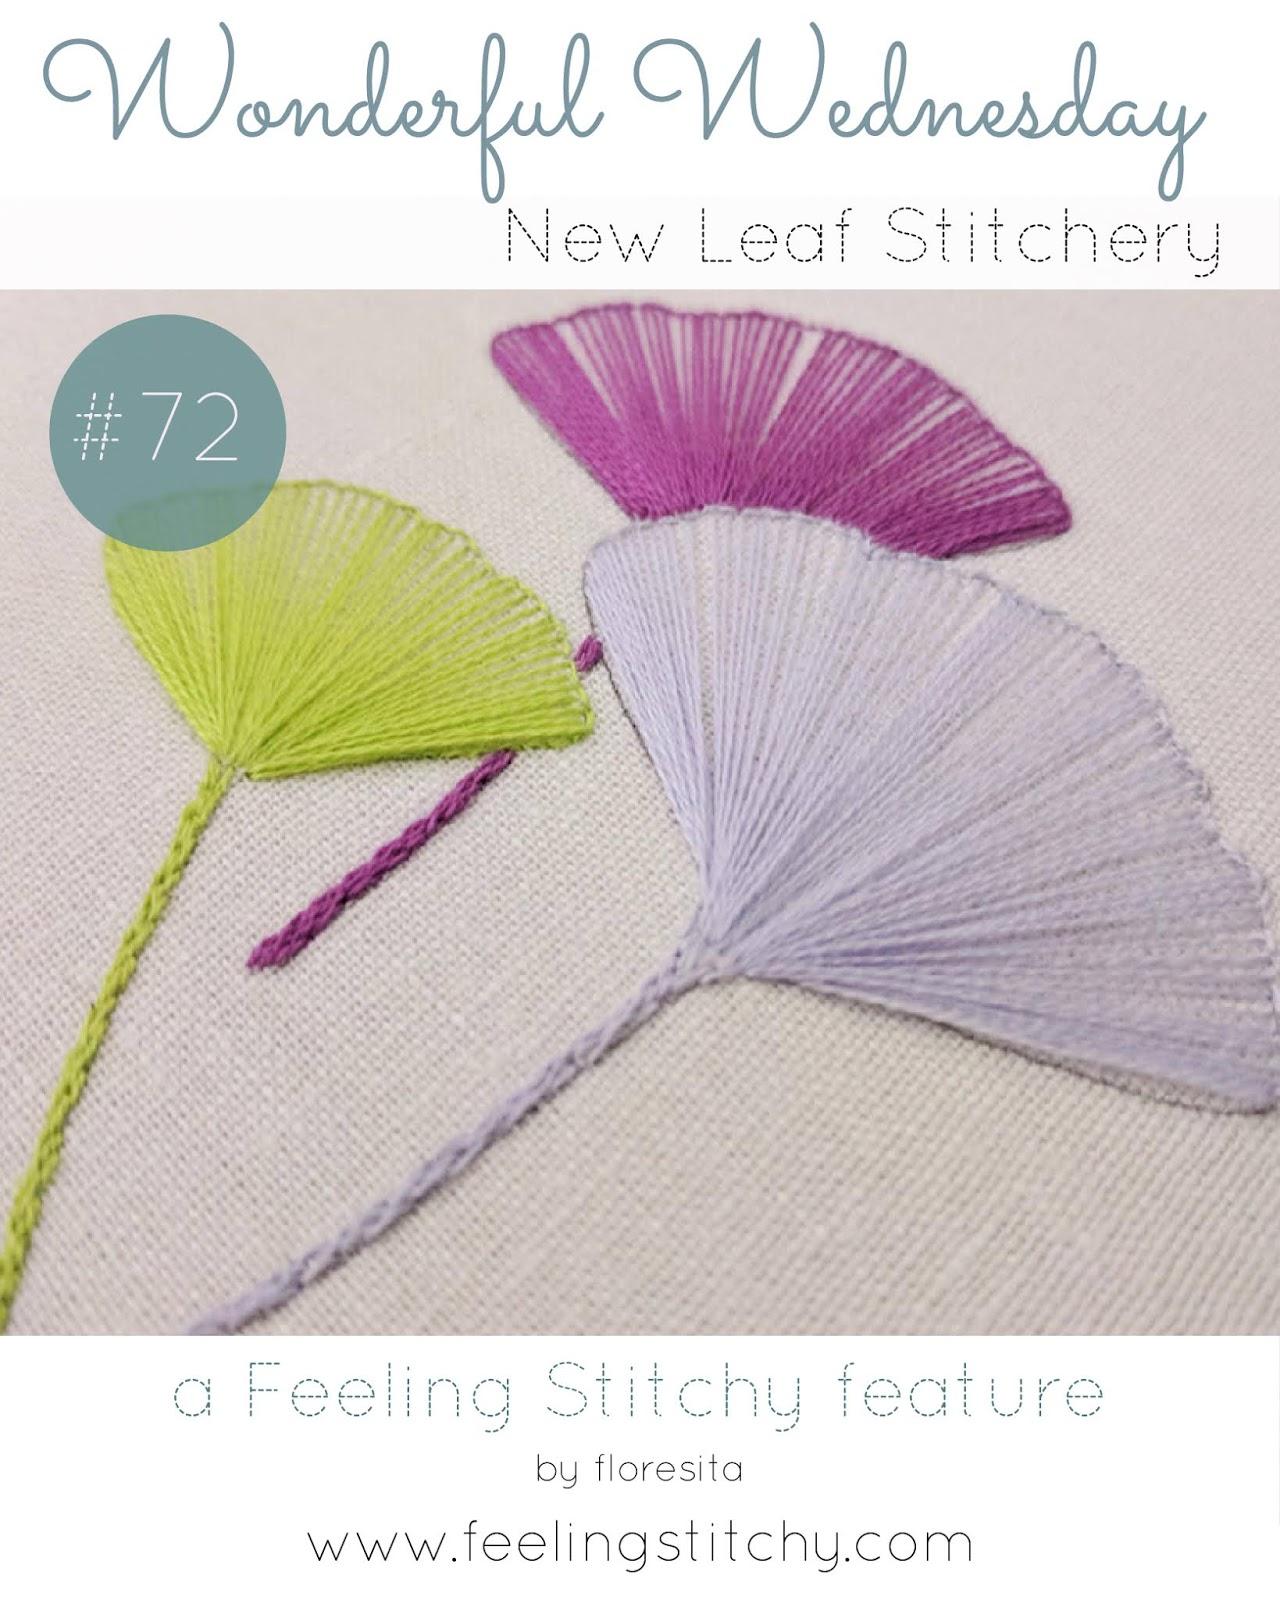 Wonderful Wednesday 72 New Leaf Stitchery as featured by floresita on Feeling Stitchy